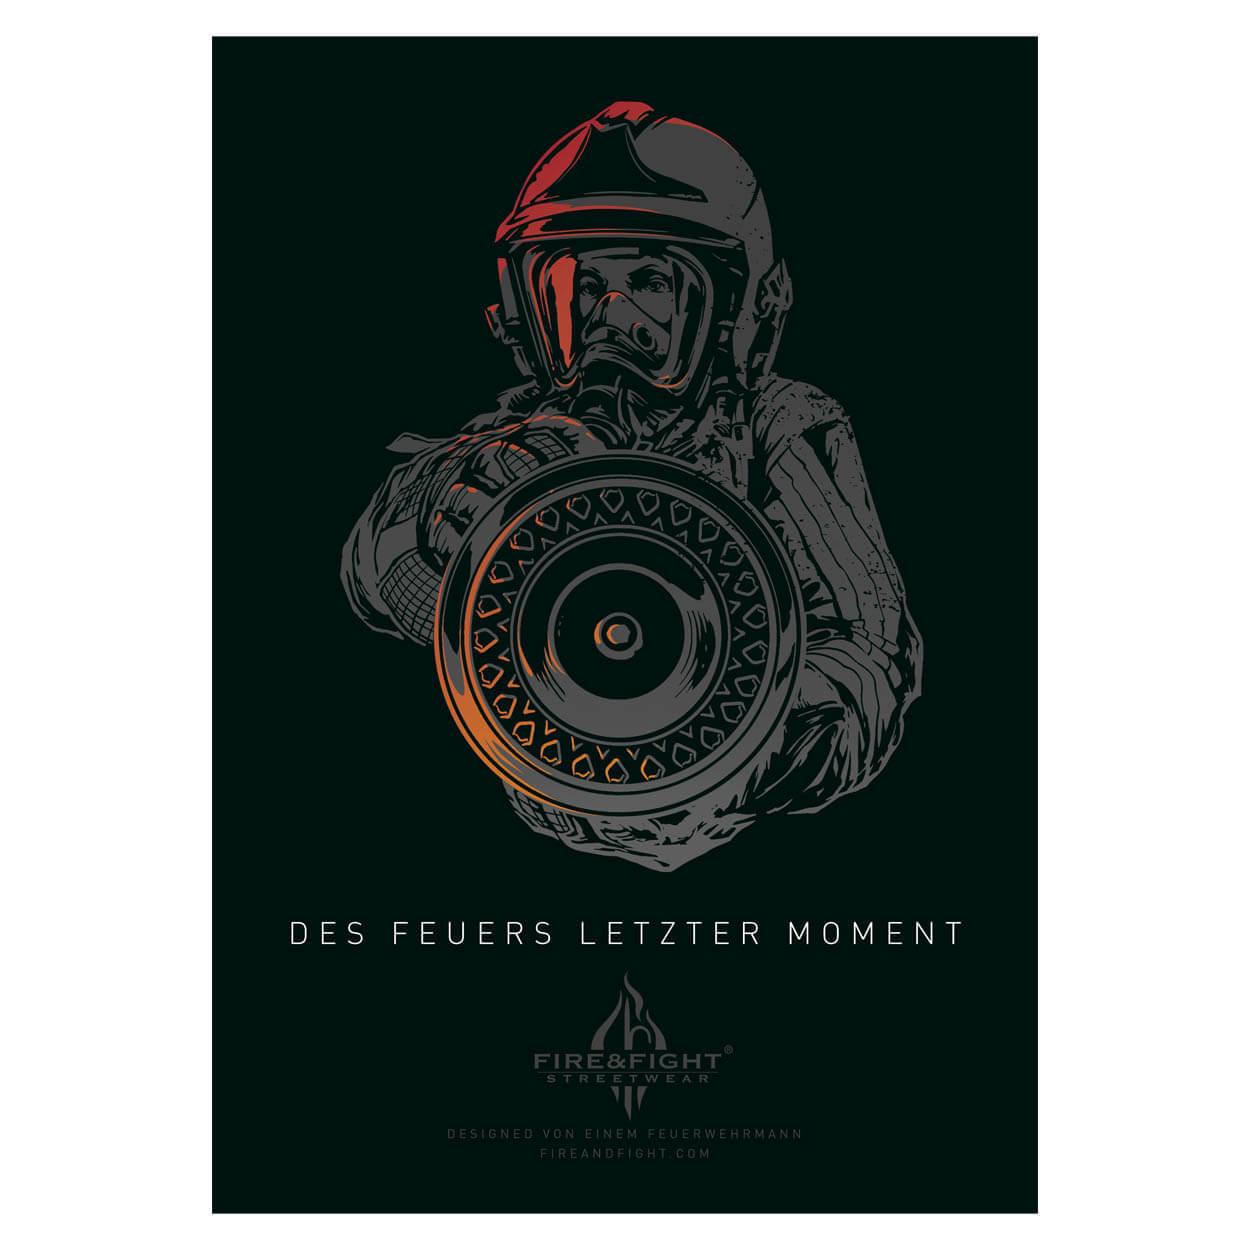 Des Feuers letzter Moment - Feuerwehrposter 100 x 70 cm